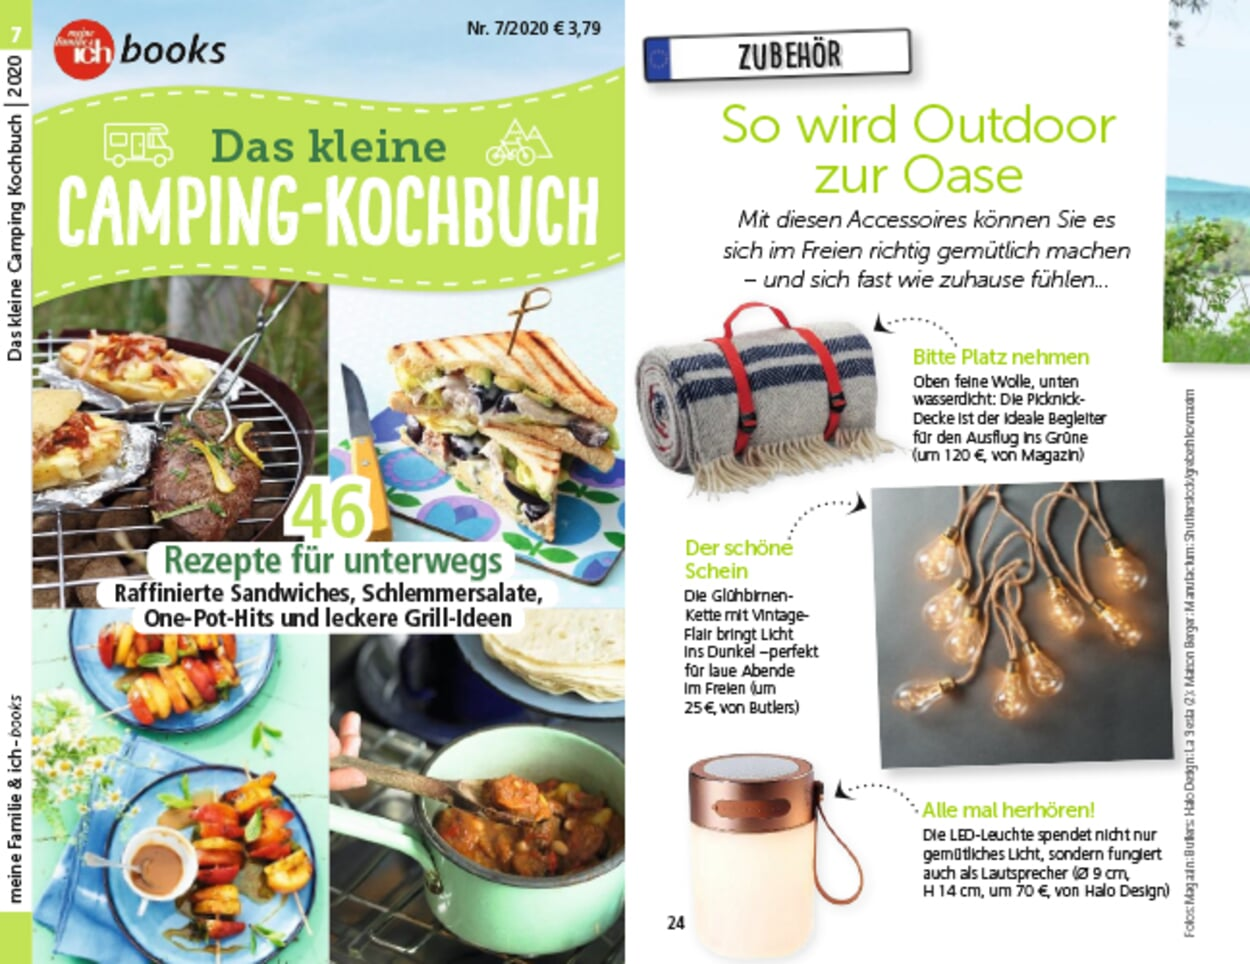 Das kleine Camping-Kochbuch